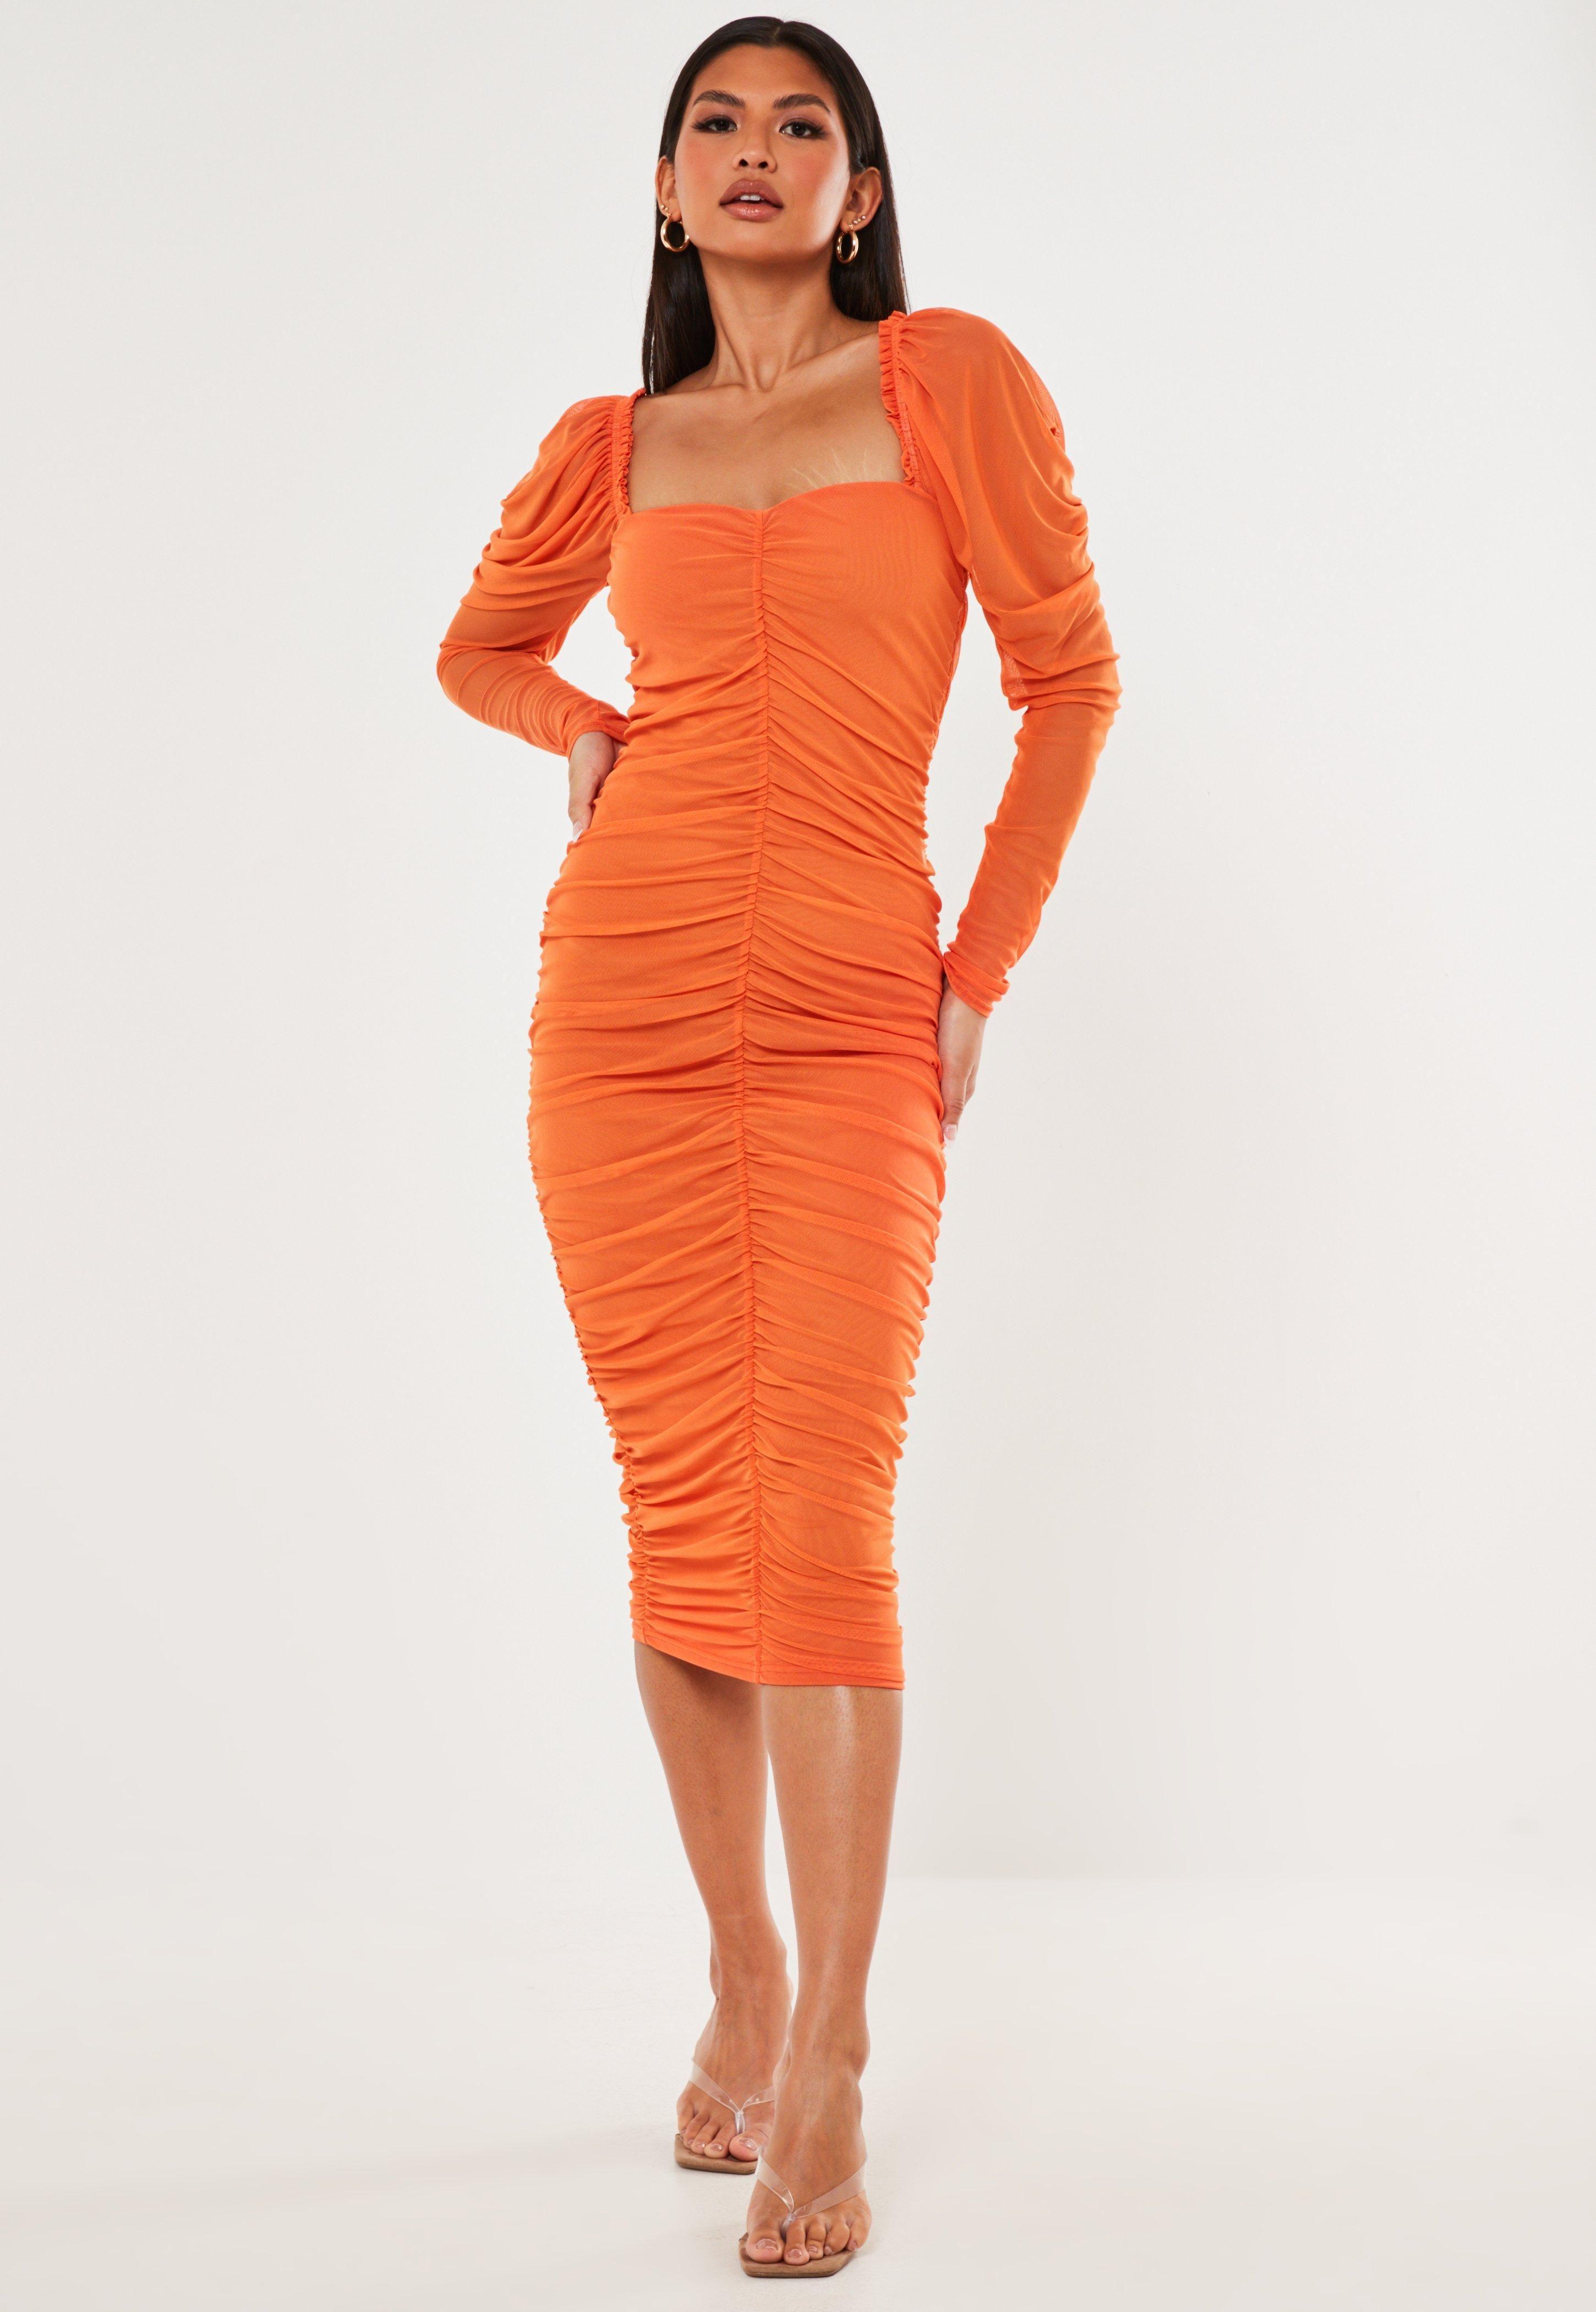 Missguided Orange Ruched Milkmaid Mesh Midaxi Dress Fashion Inspo Outfits Dresses Fashion [ 4200 x 2900 Pixel ]